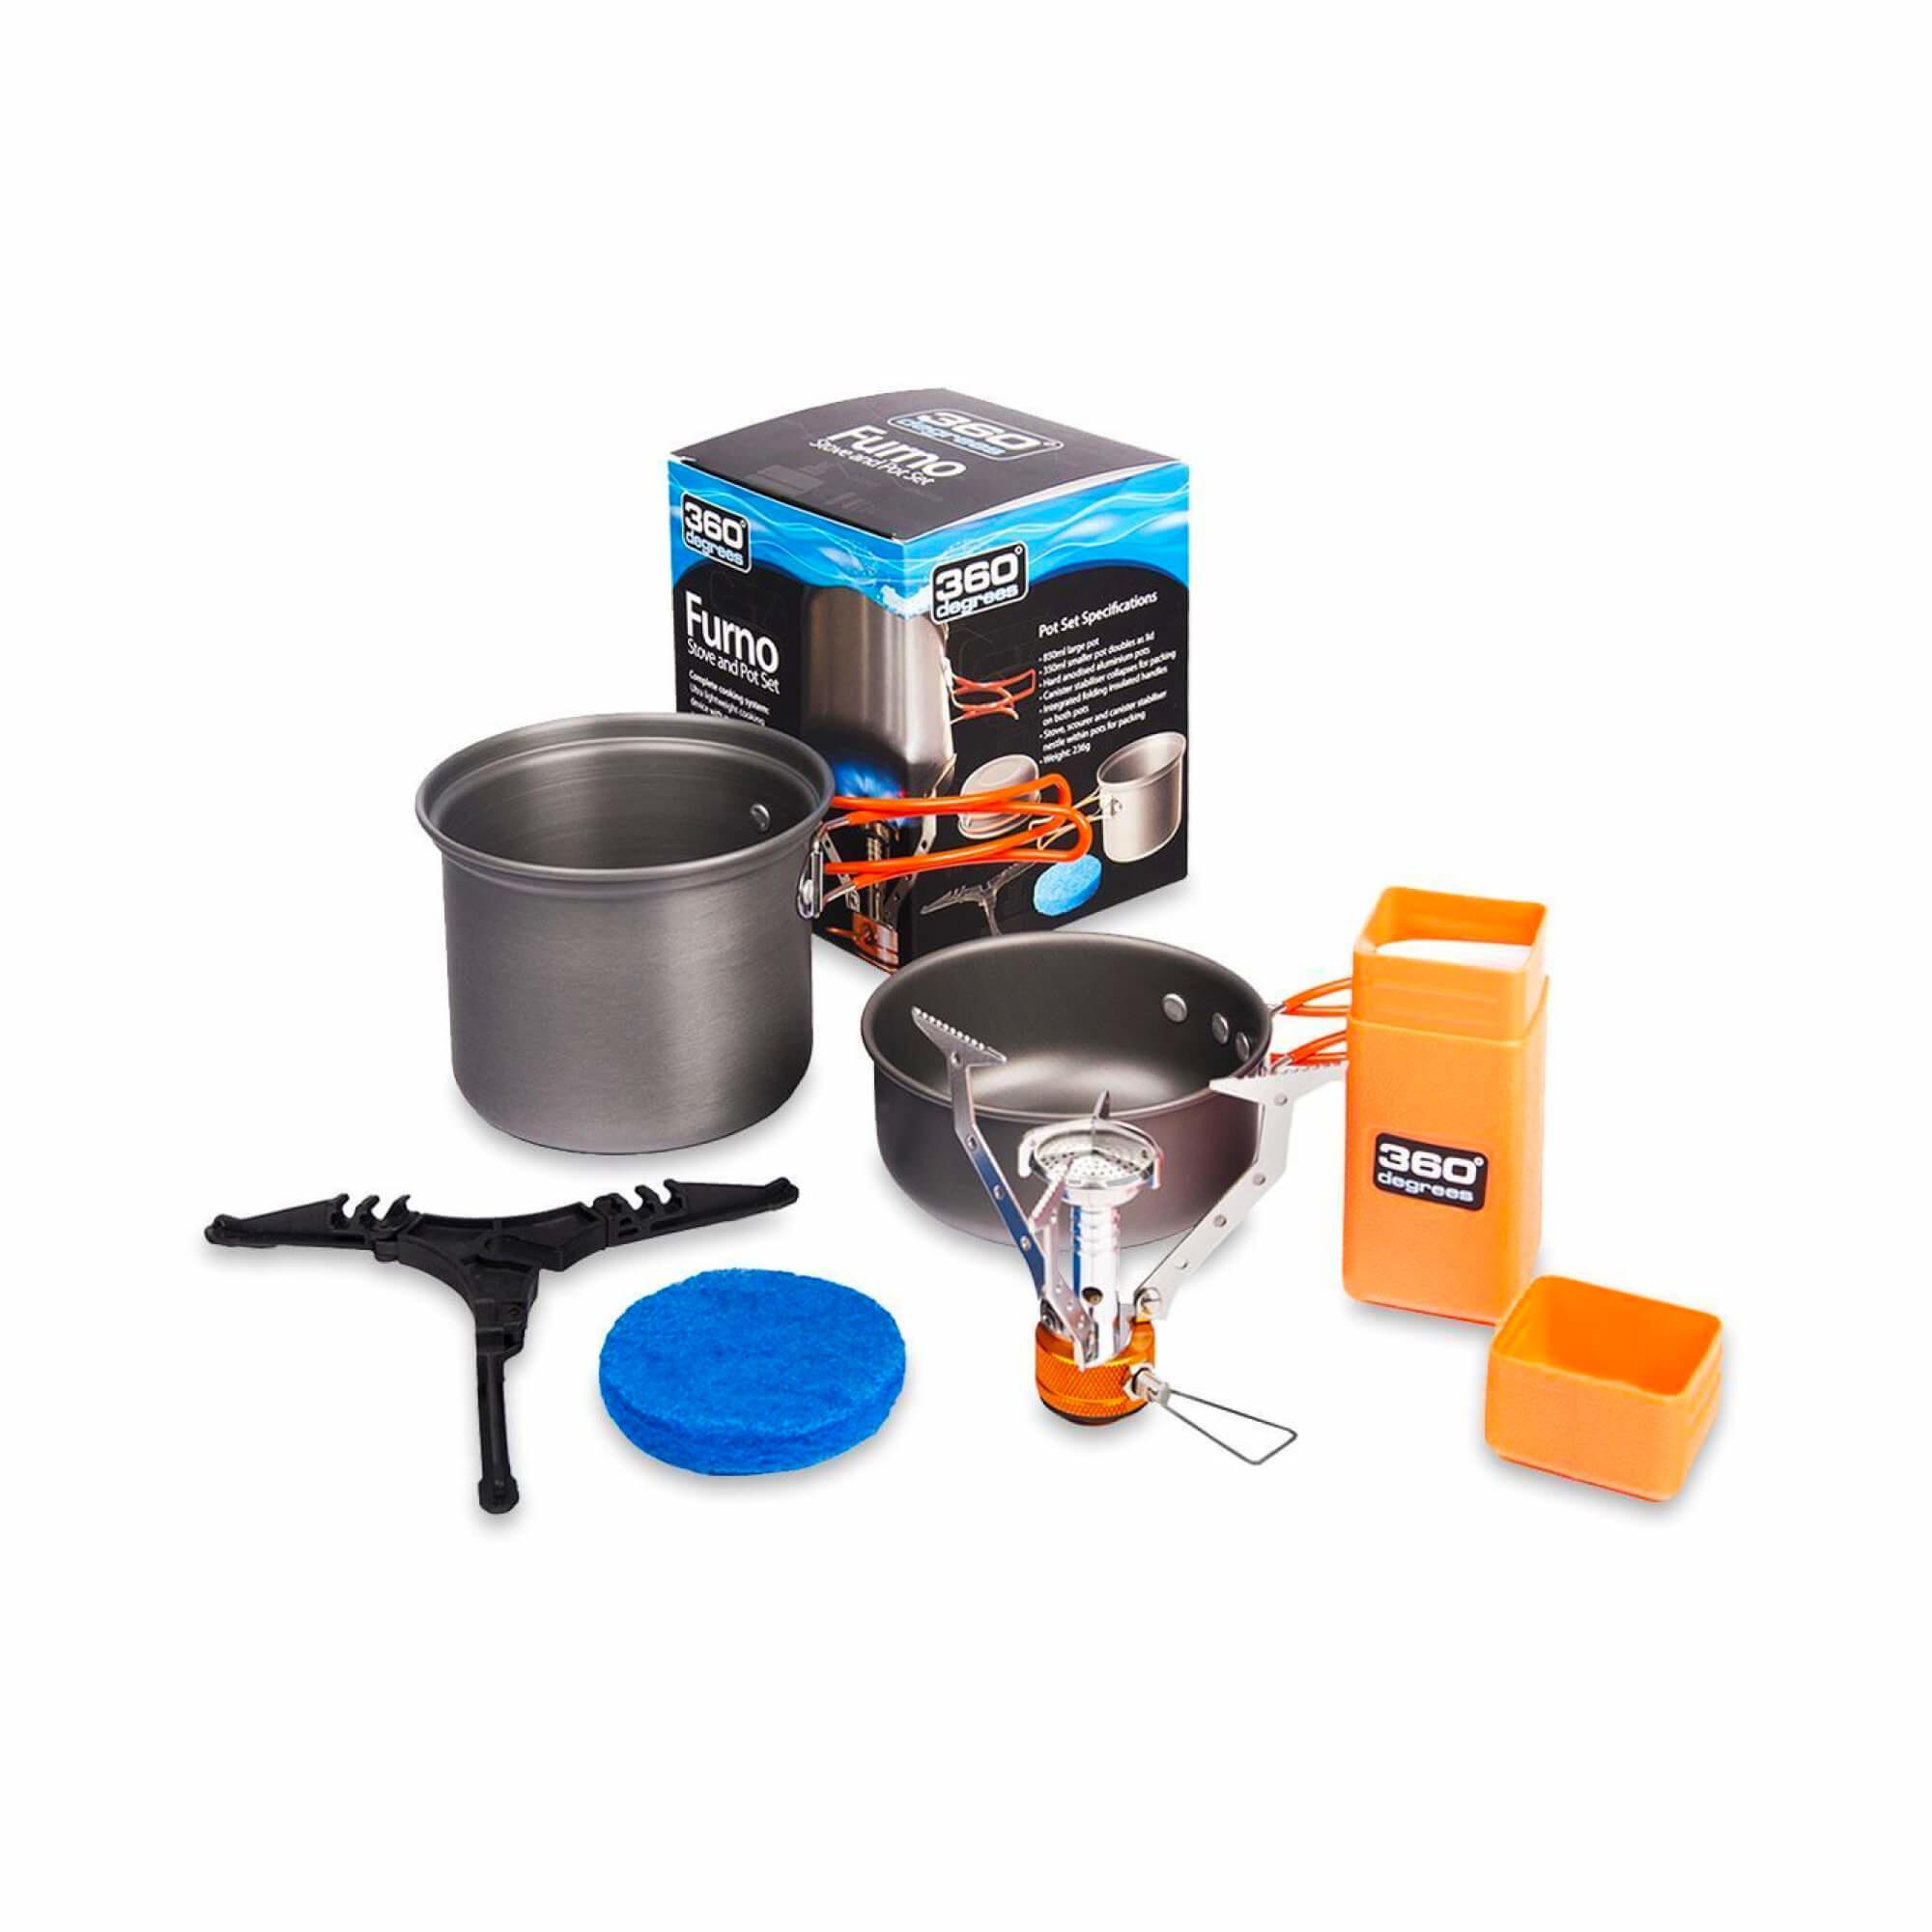 Furno Stove & Pot Set-1